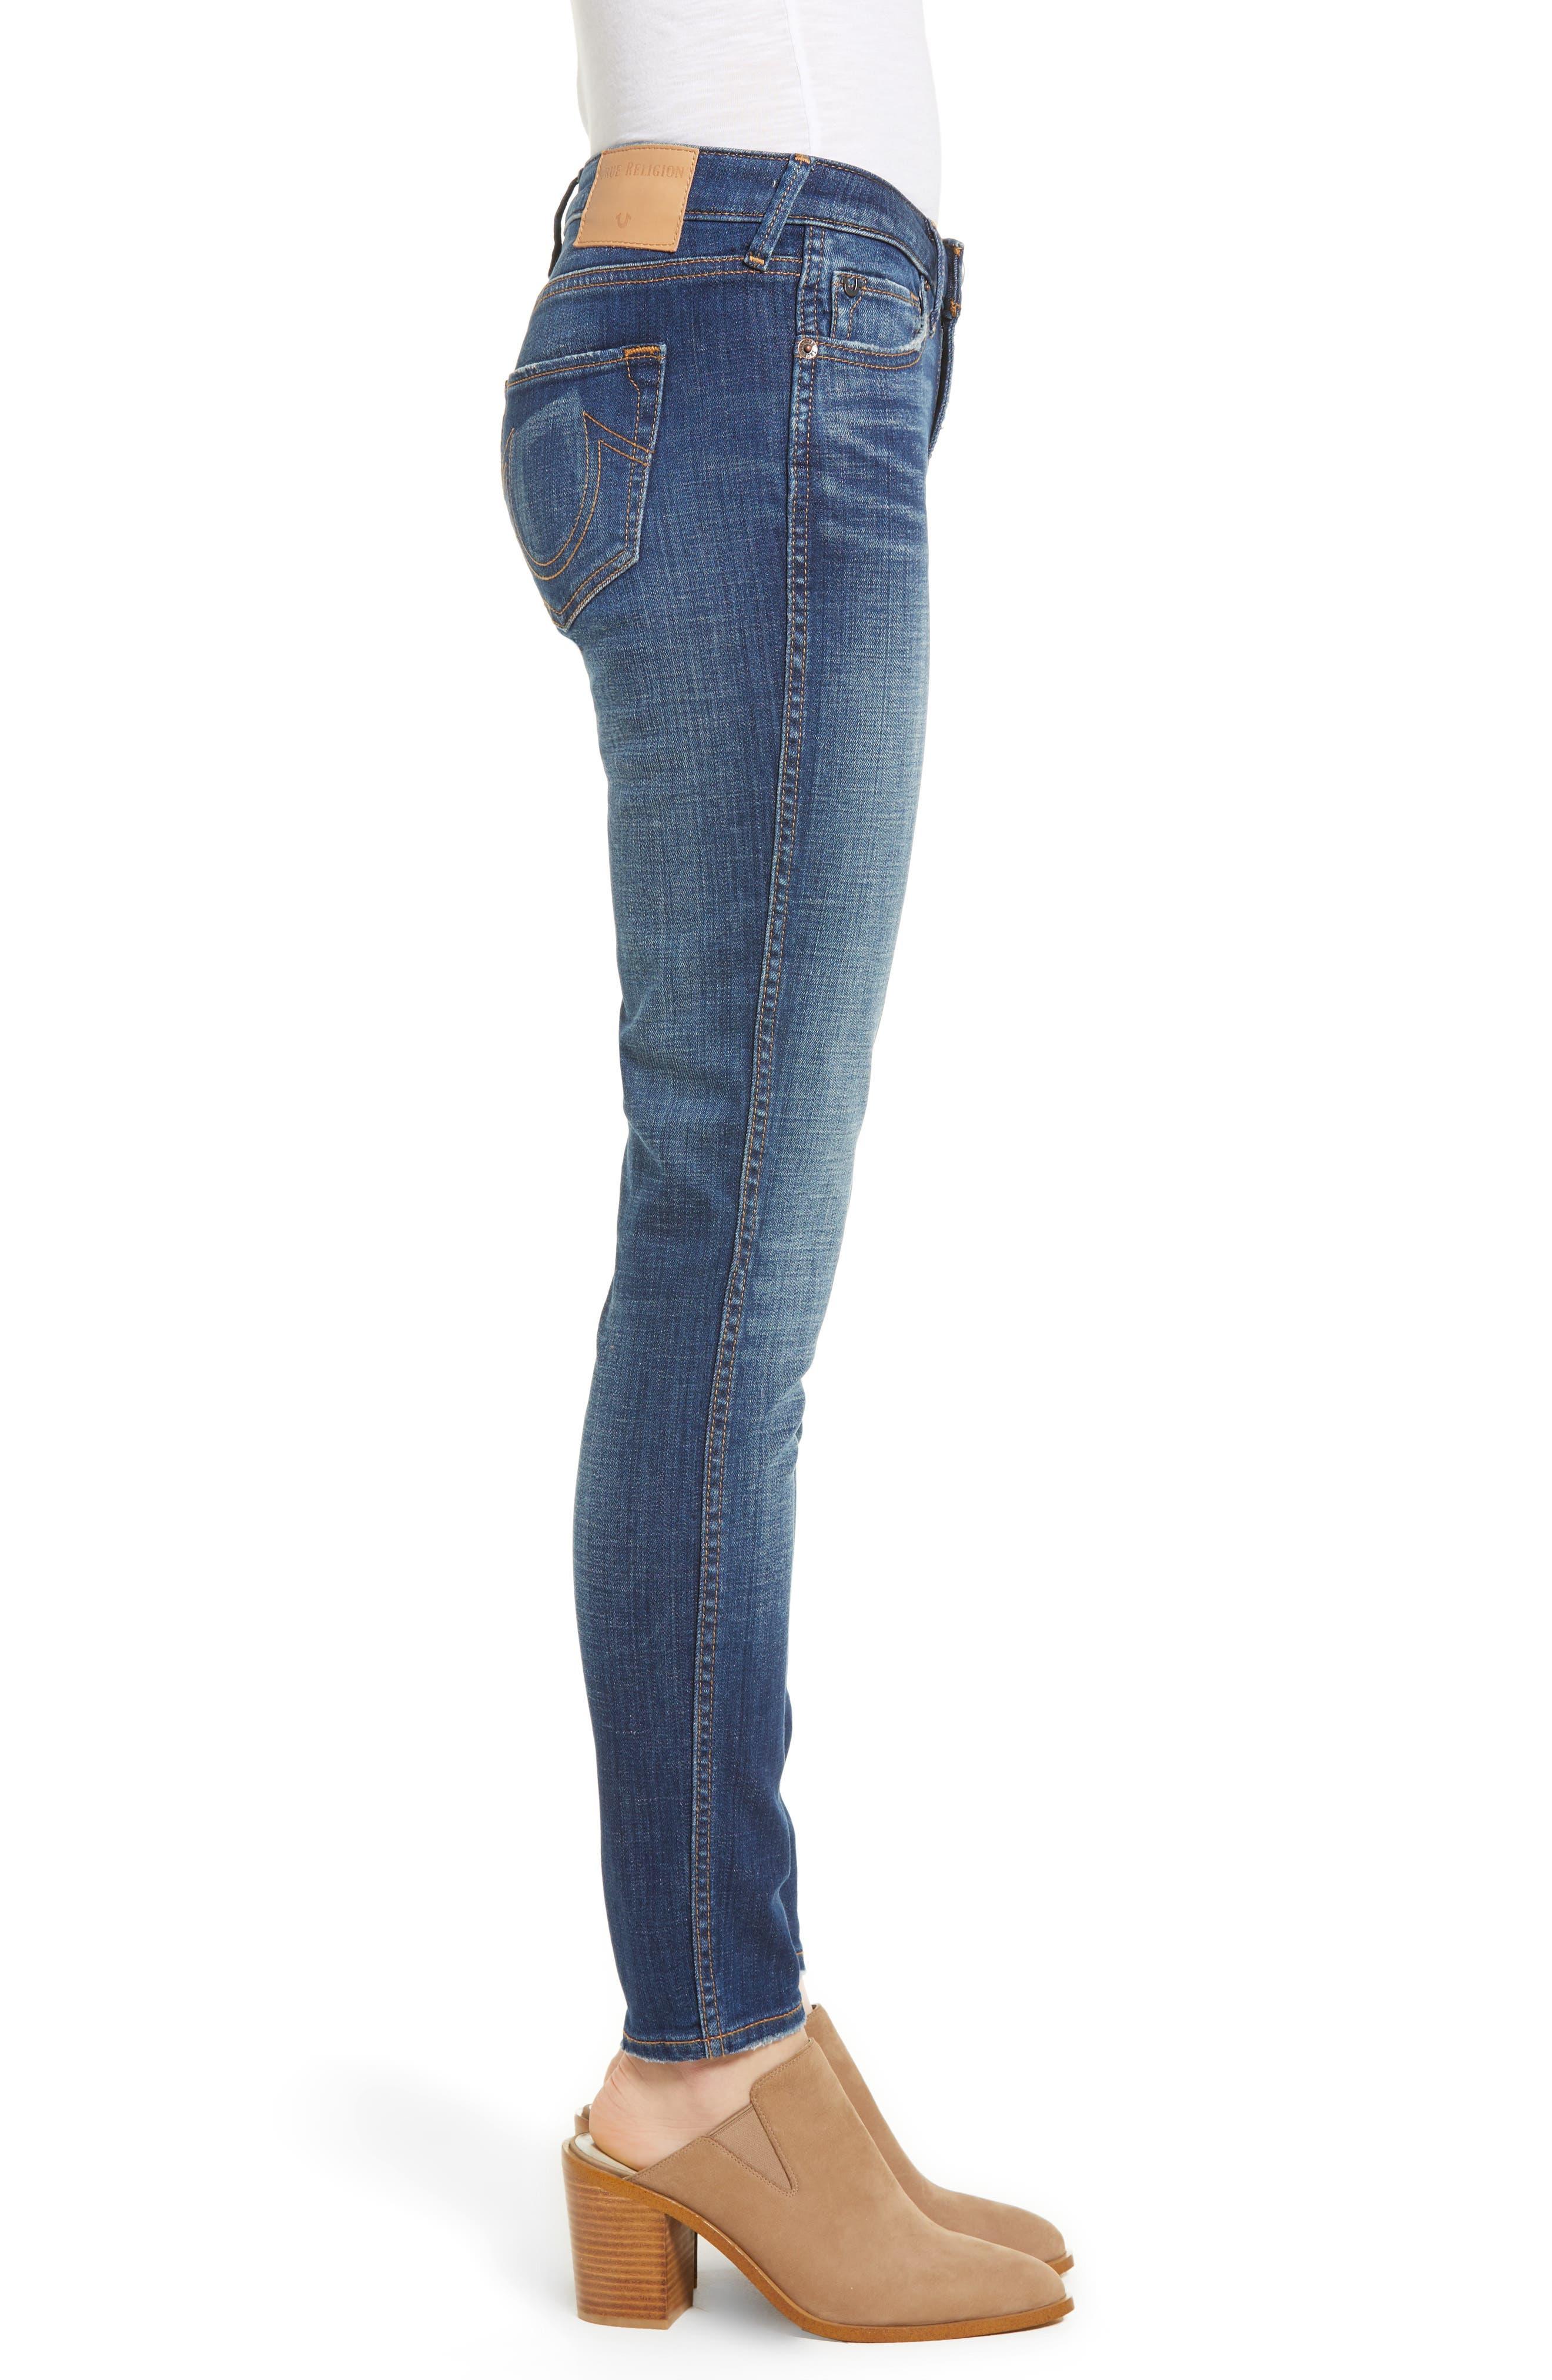 Halle Mid Rise Super Skinny Jeans,                             Alternate thumbnail 3, color,                             Esqm Gen Y